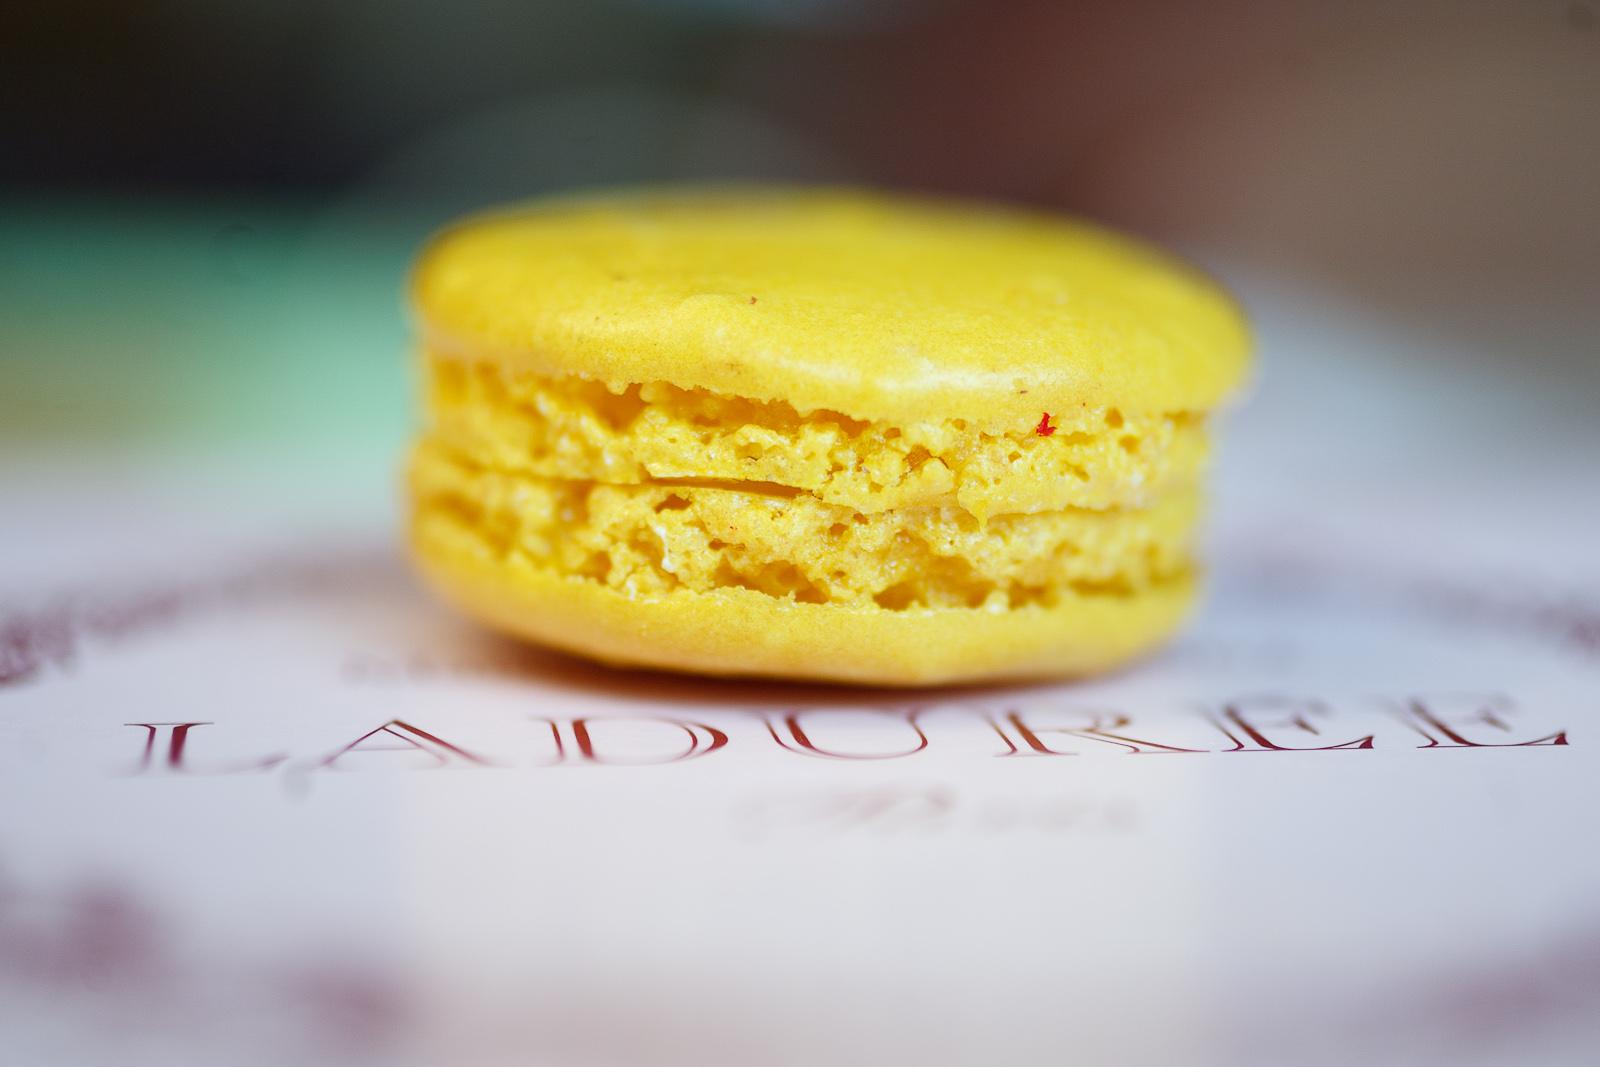 Macaron au citron (lemon)